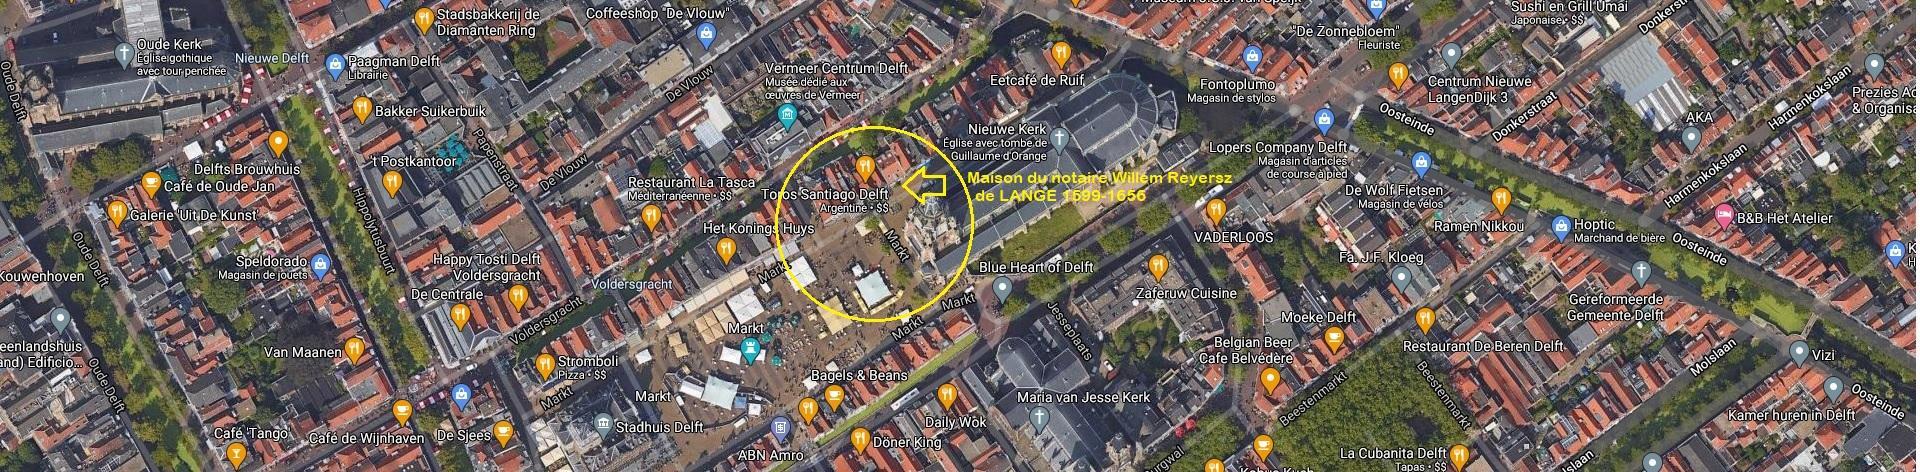 Delft grote markt vue satellite